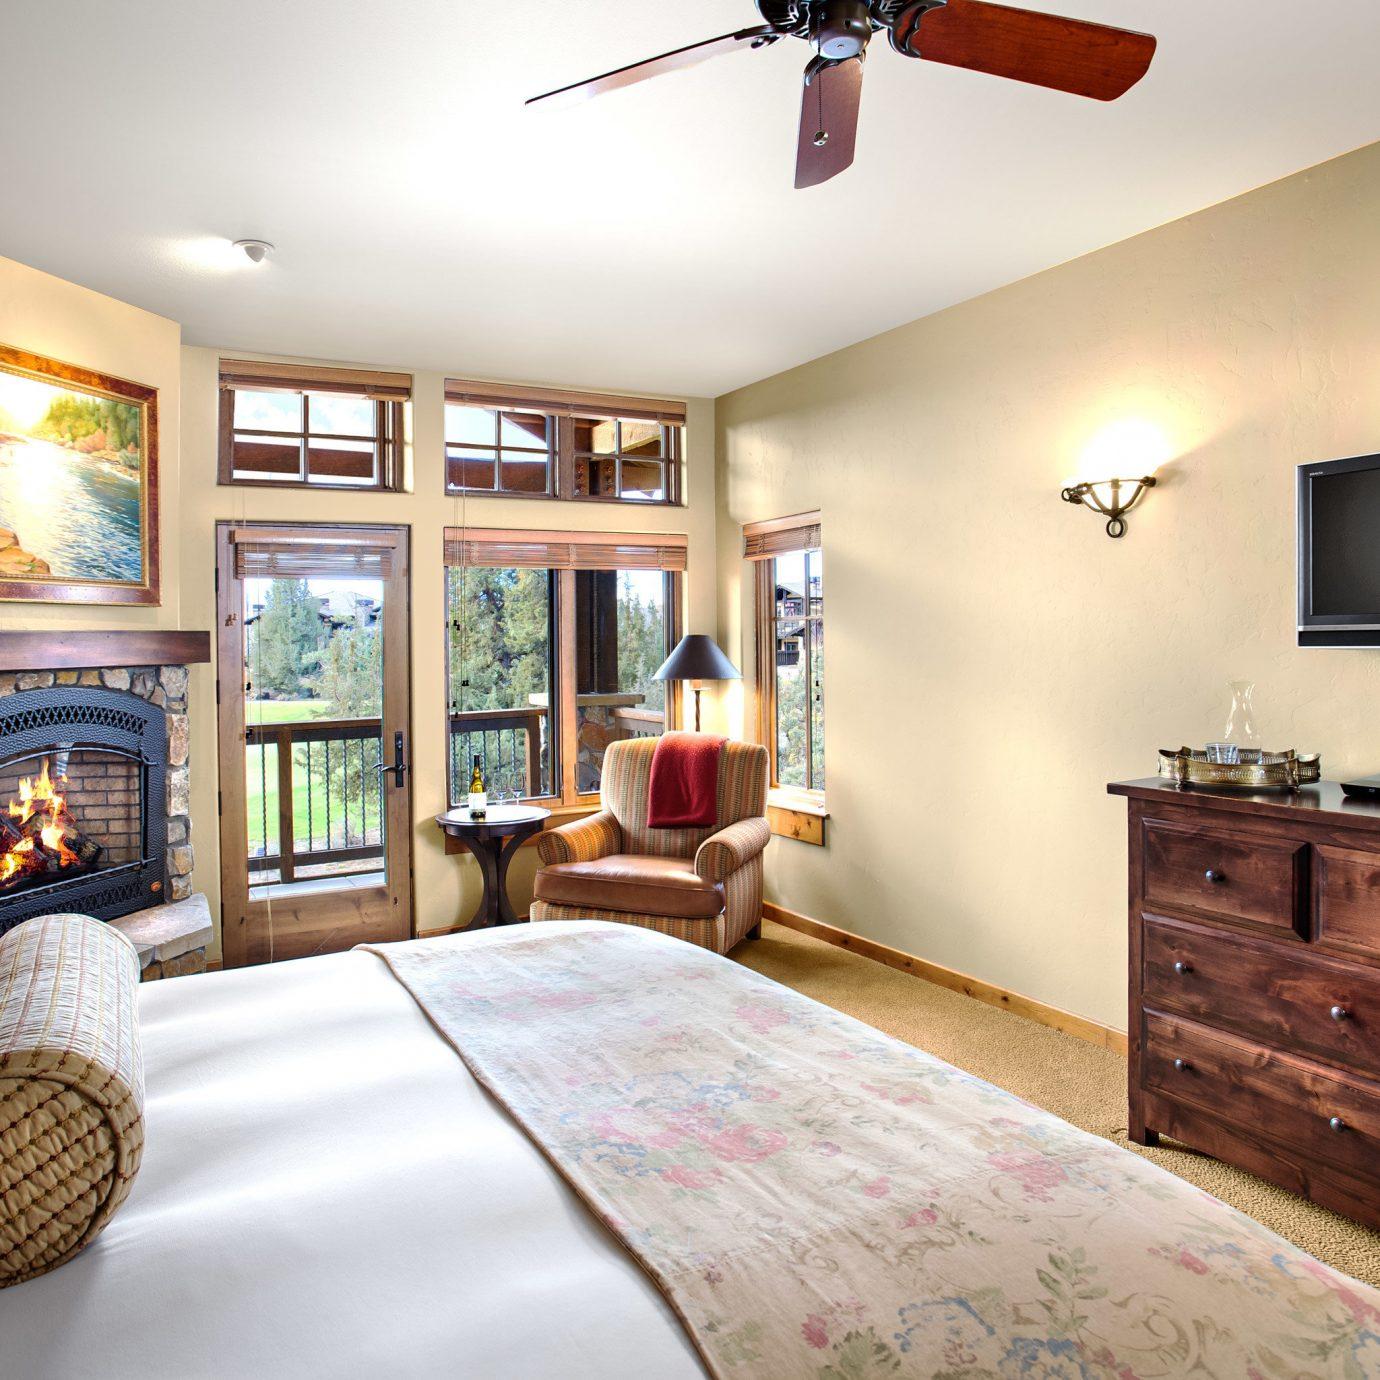 Bedroom Fireplace Resort Scenic views Suite sofa property home living room hardwood cottage flat